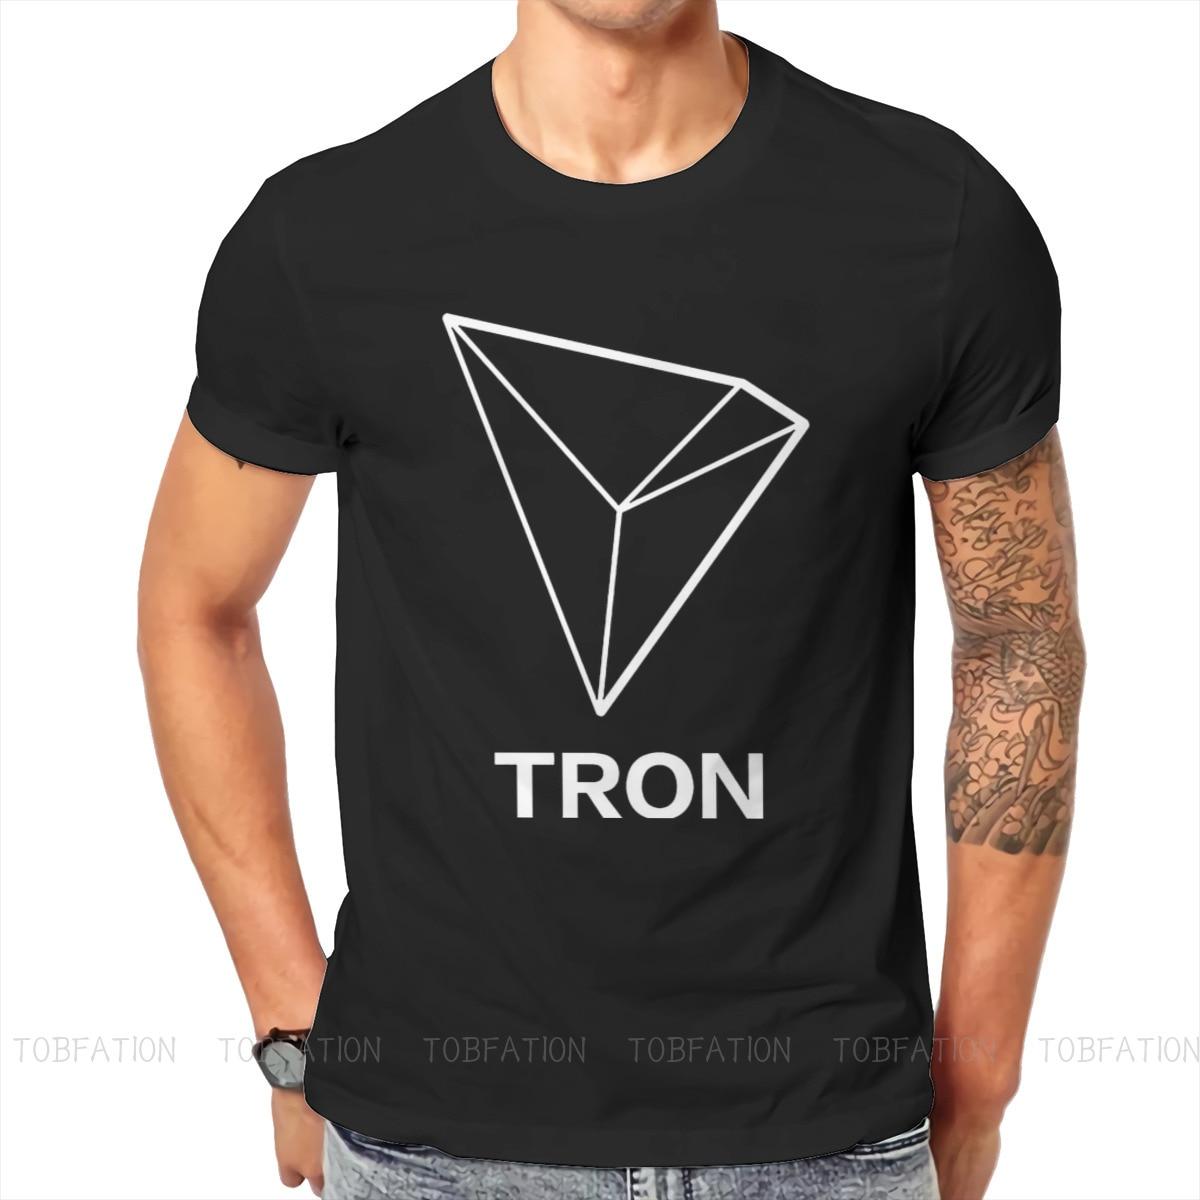 TRON TRX Essential Newest TShirts Bitcoin Male Harajuku Pure Cotton Tops T Shirt O Neck Big Size 1